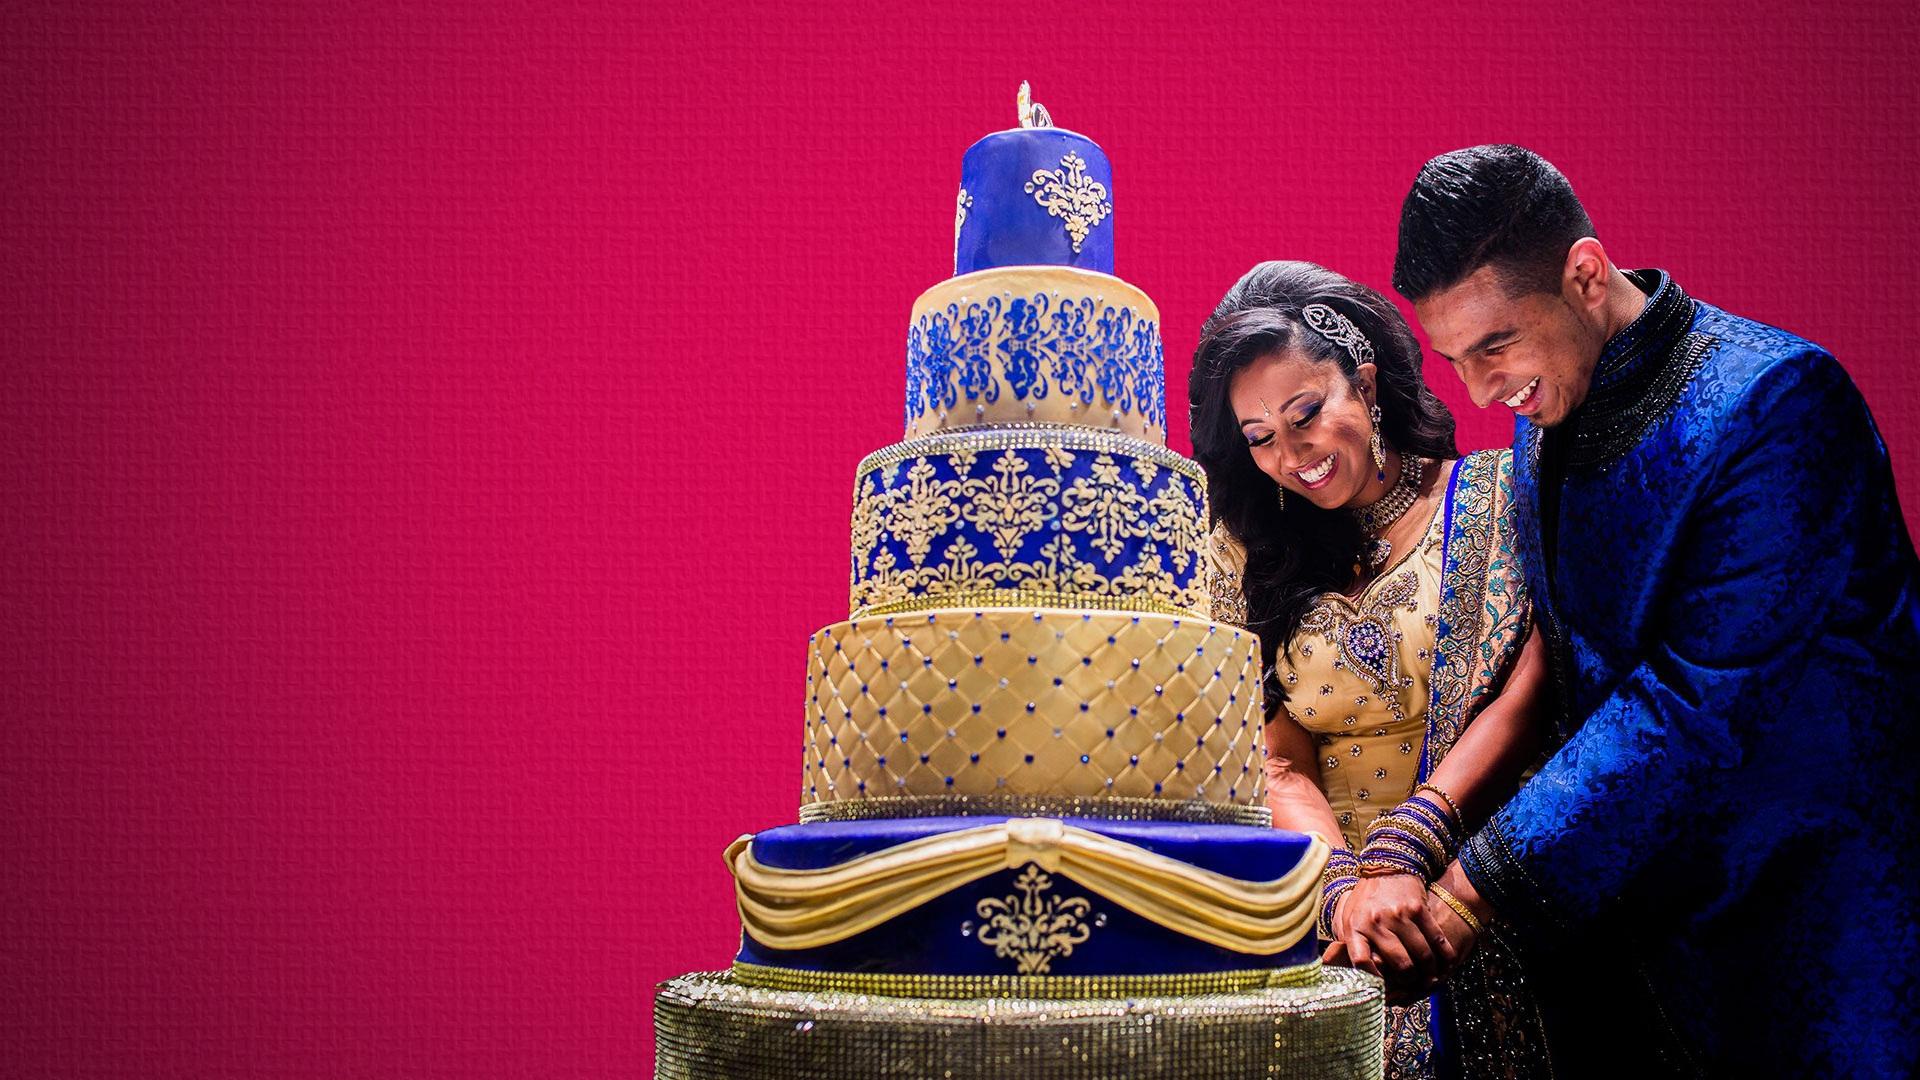 Decorative Fondant Cakes